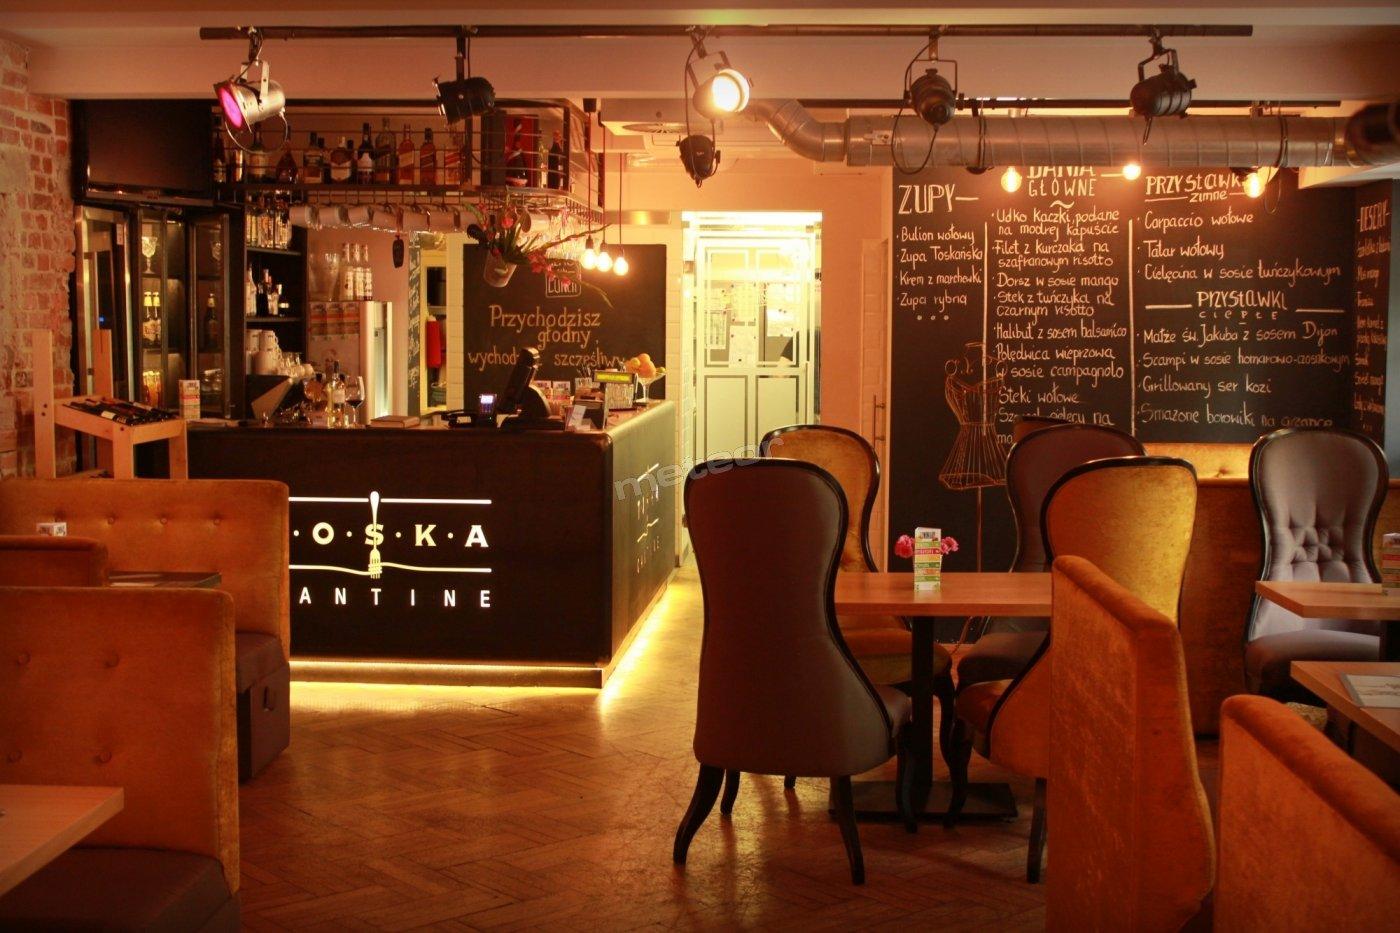 Restauracja Tośka Cantine